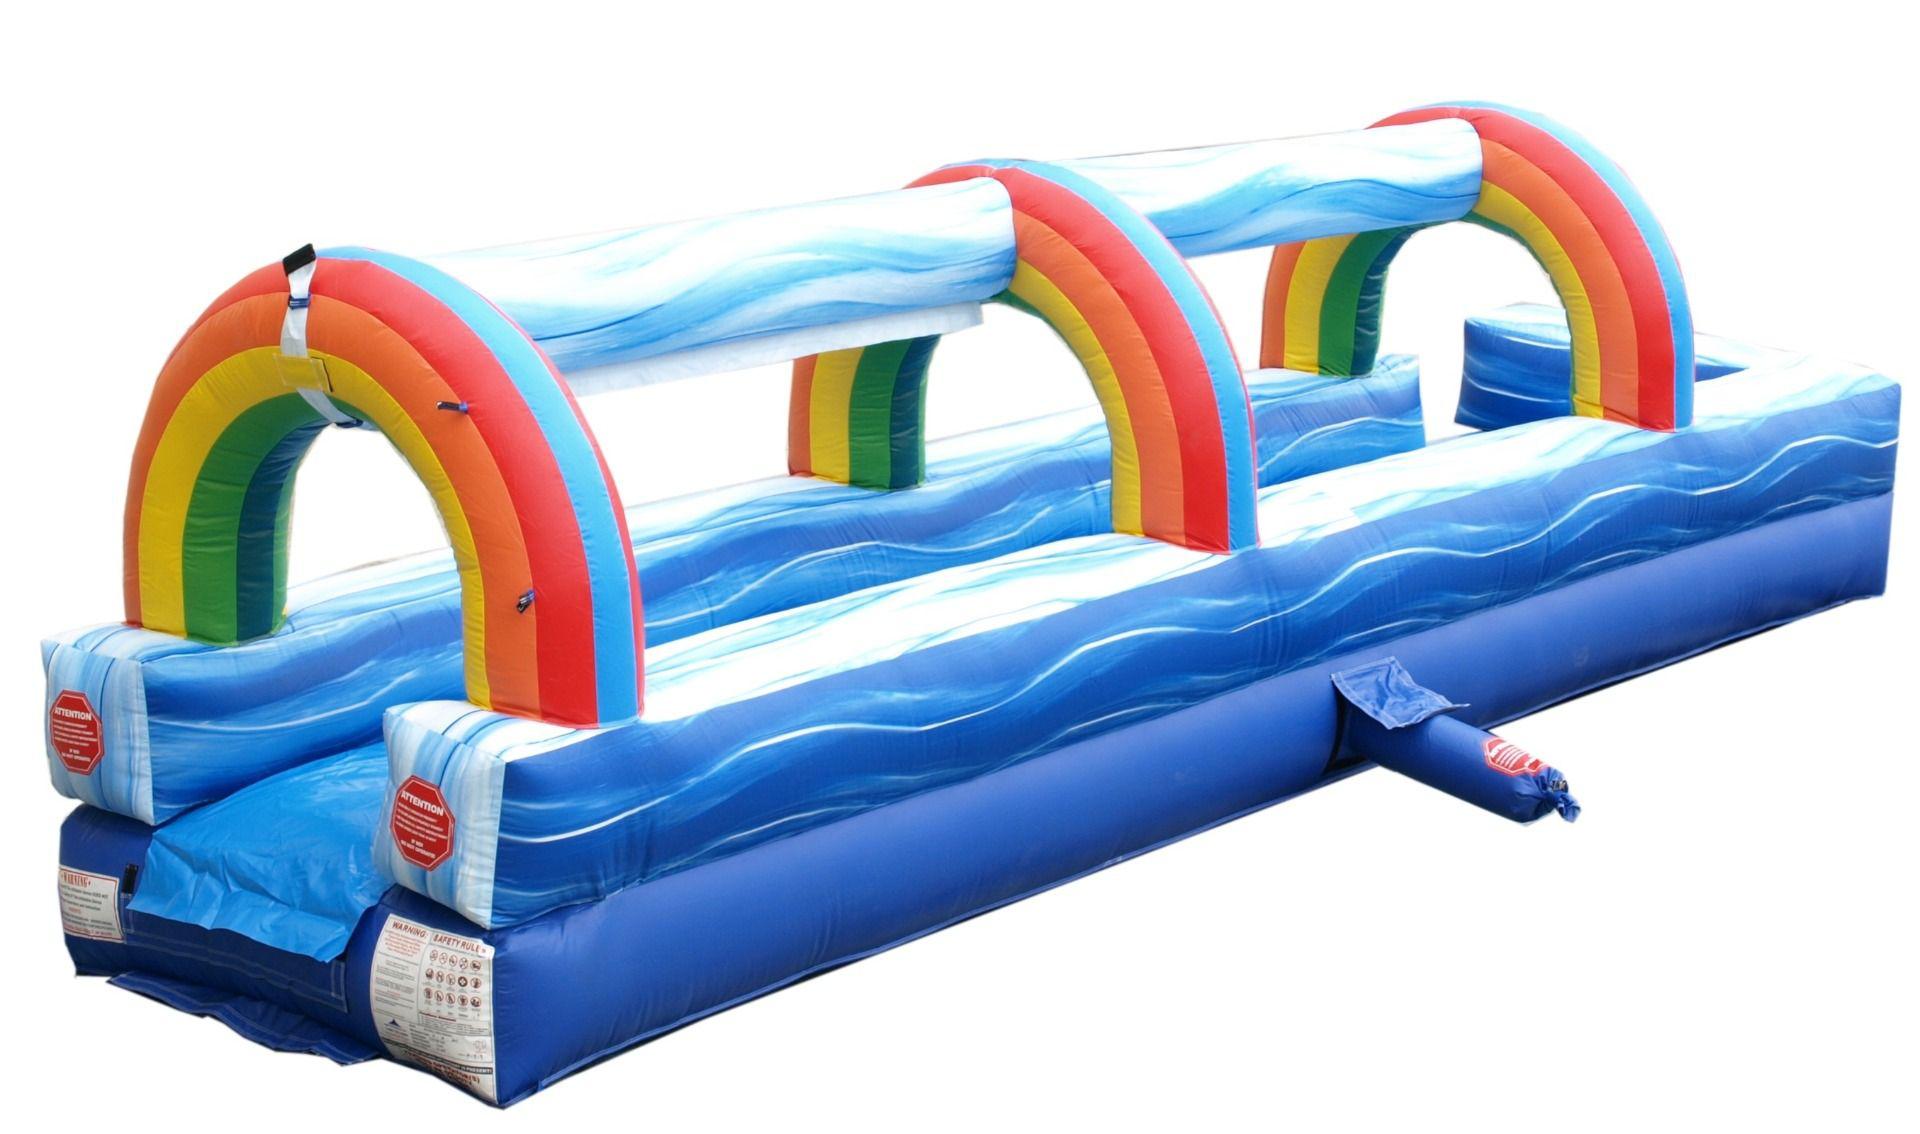 inflatable waterslide rentals Murfreesboro